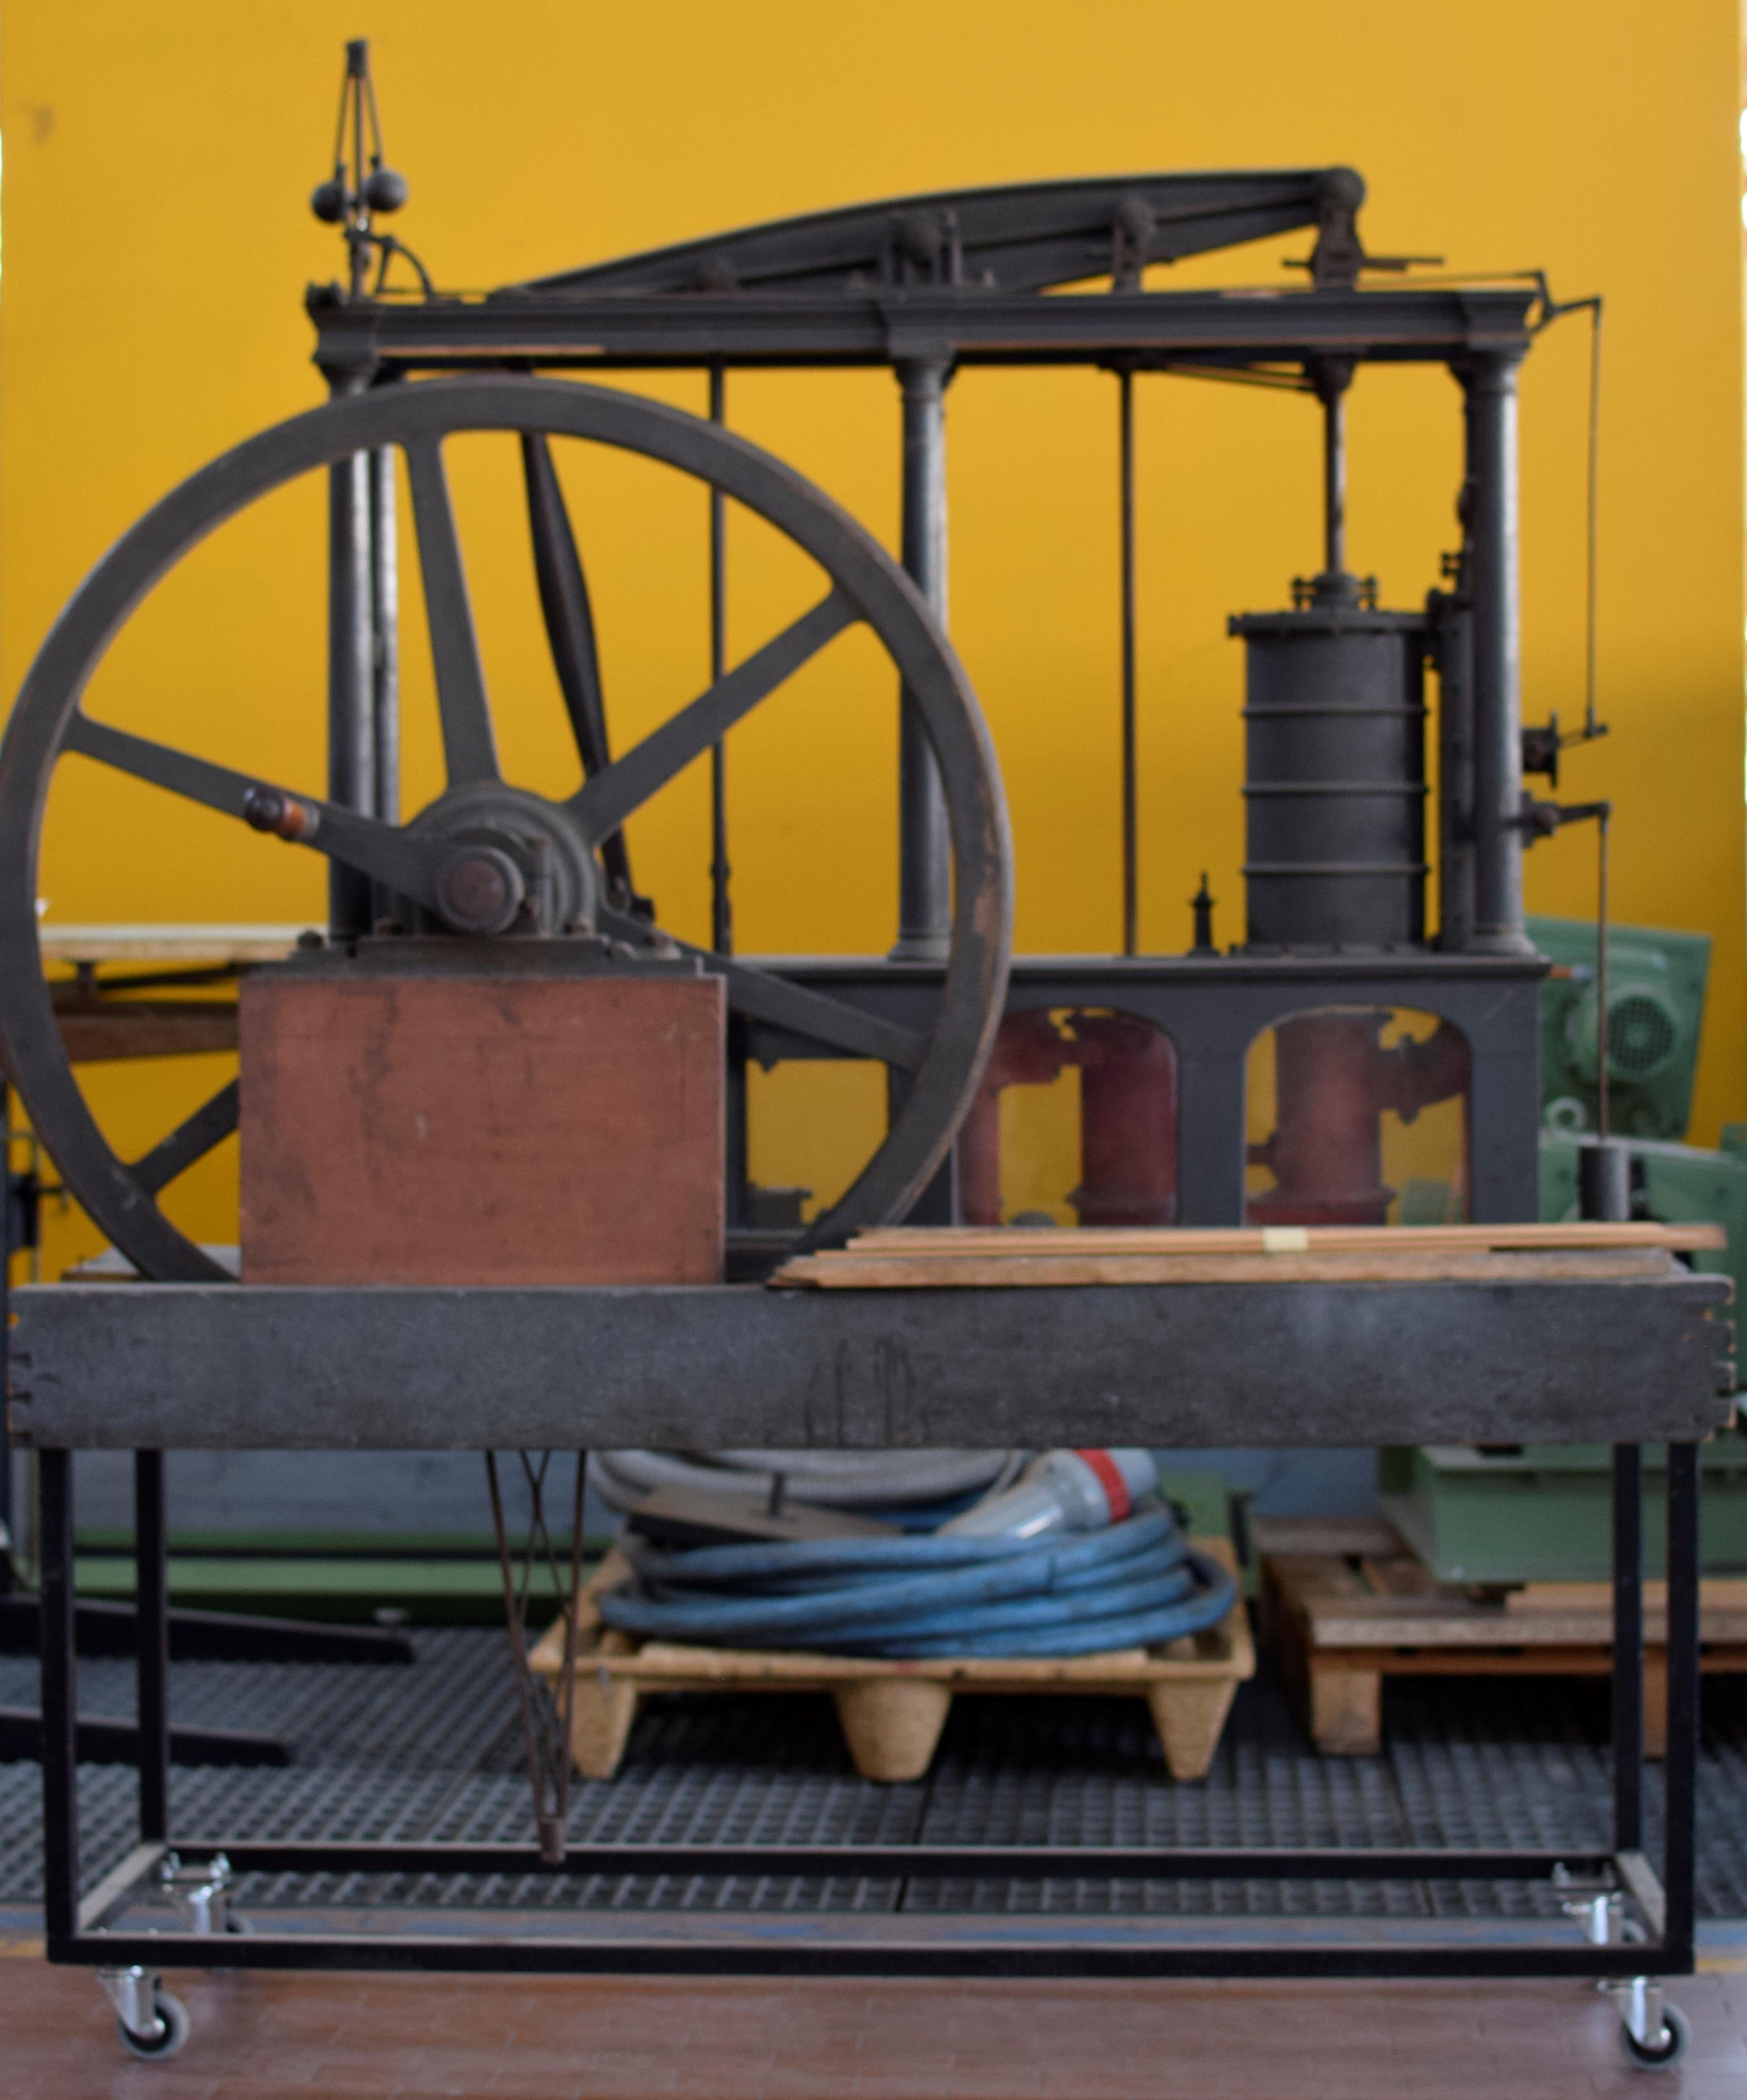 Modello di macchina a vapore di Schroeder